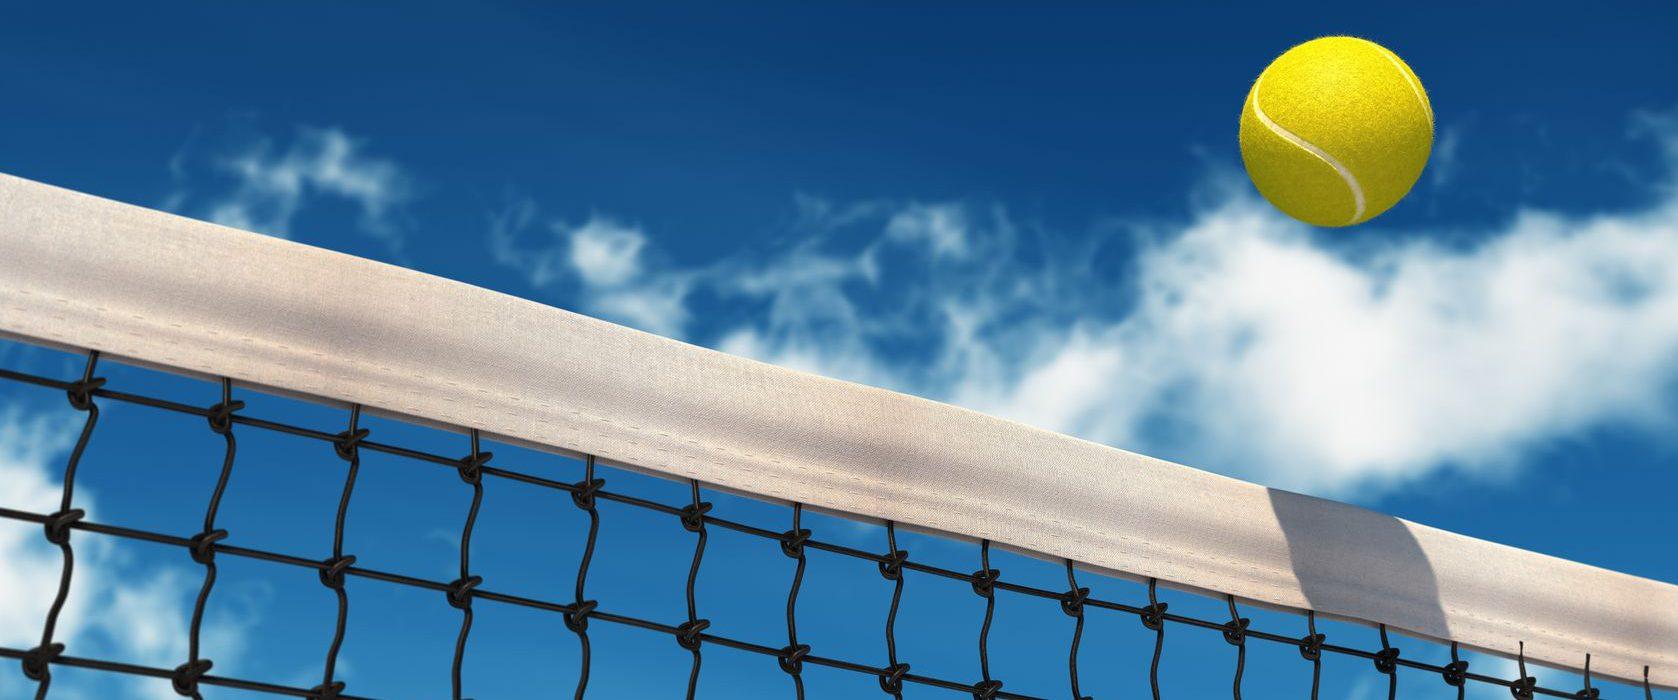 tennis-foto-e1462299247710